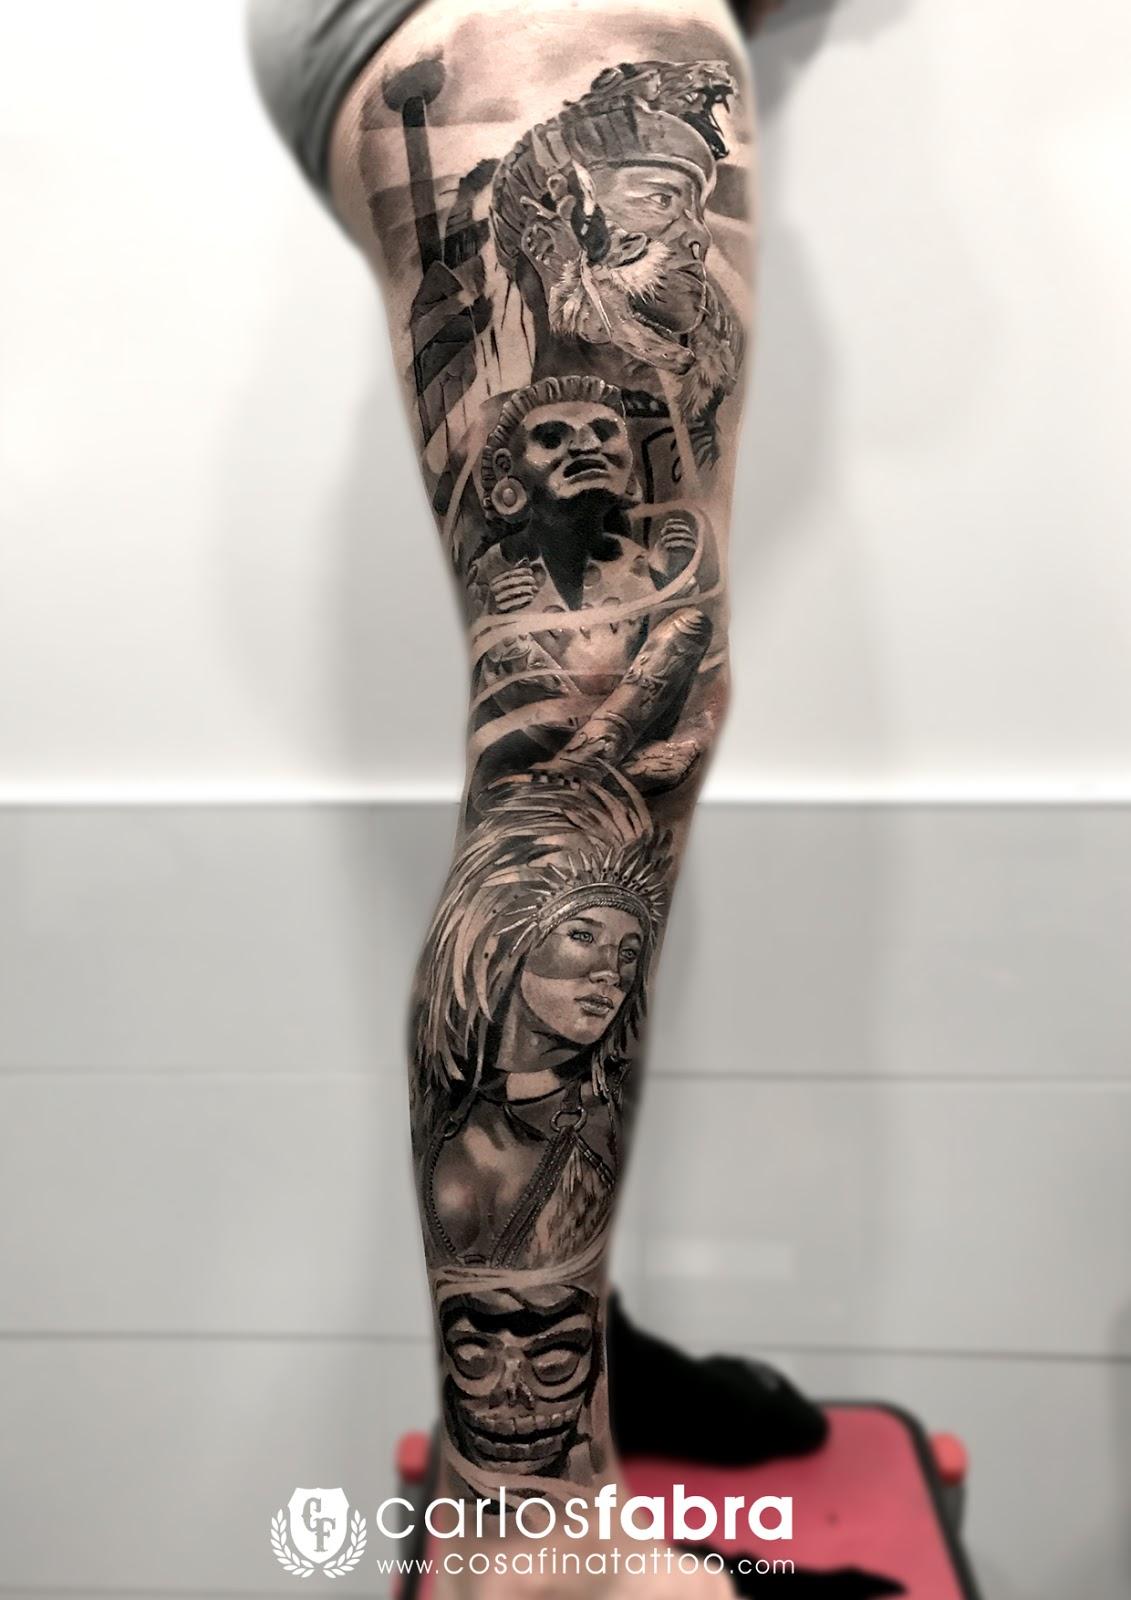 Tatuaje Manga Entera Dobby Siempr Tendra Un Calcetn Cerca Gracia A